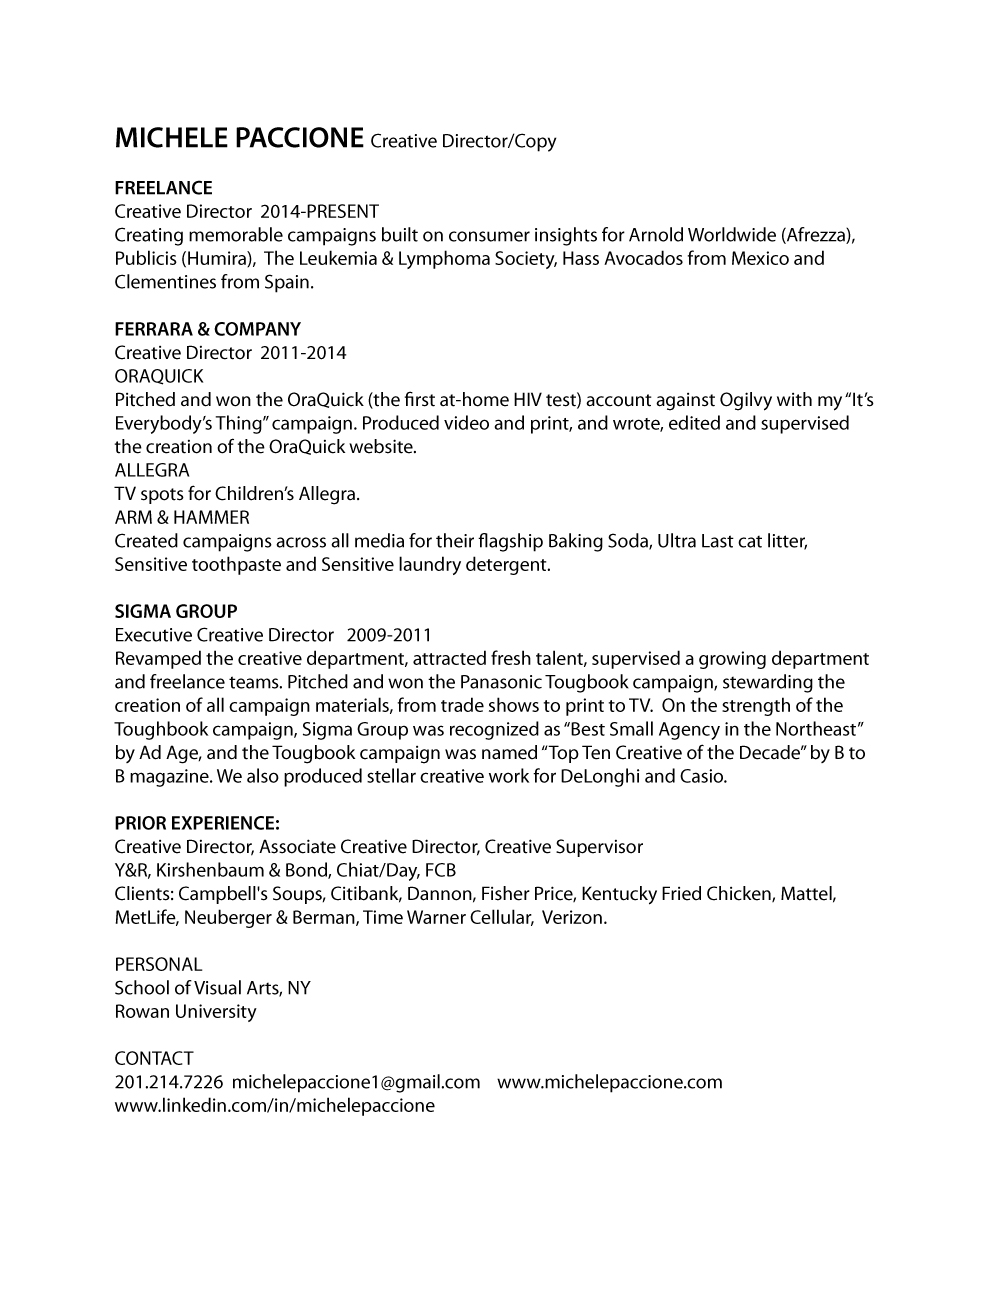 Paccione-Resume-2019.jpg